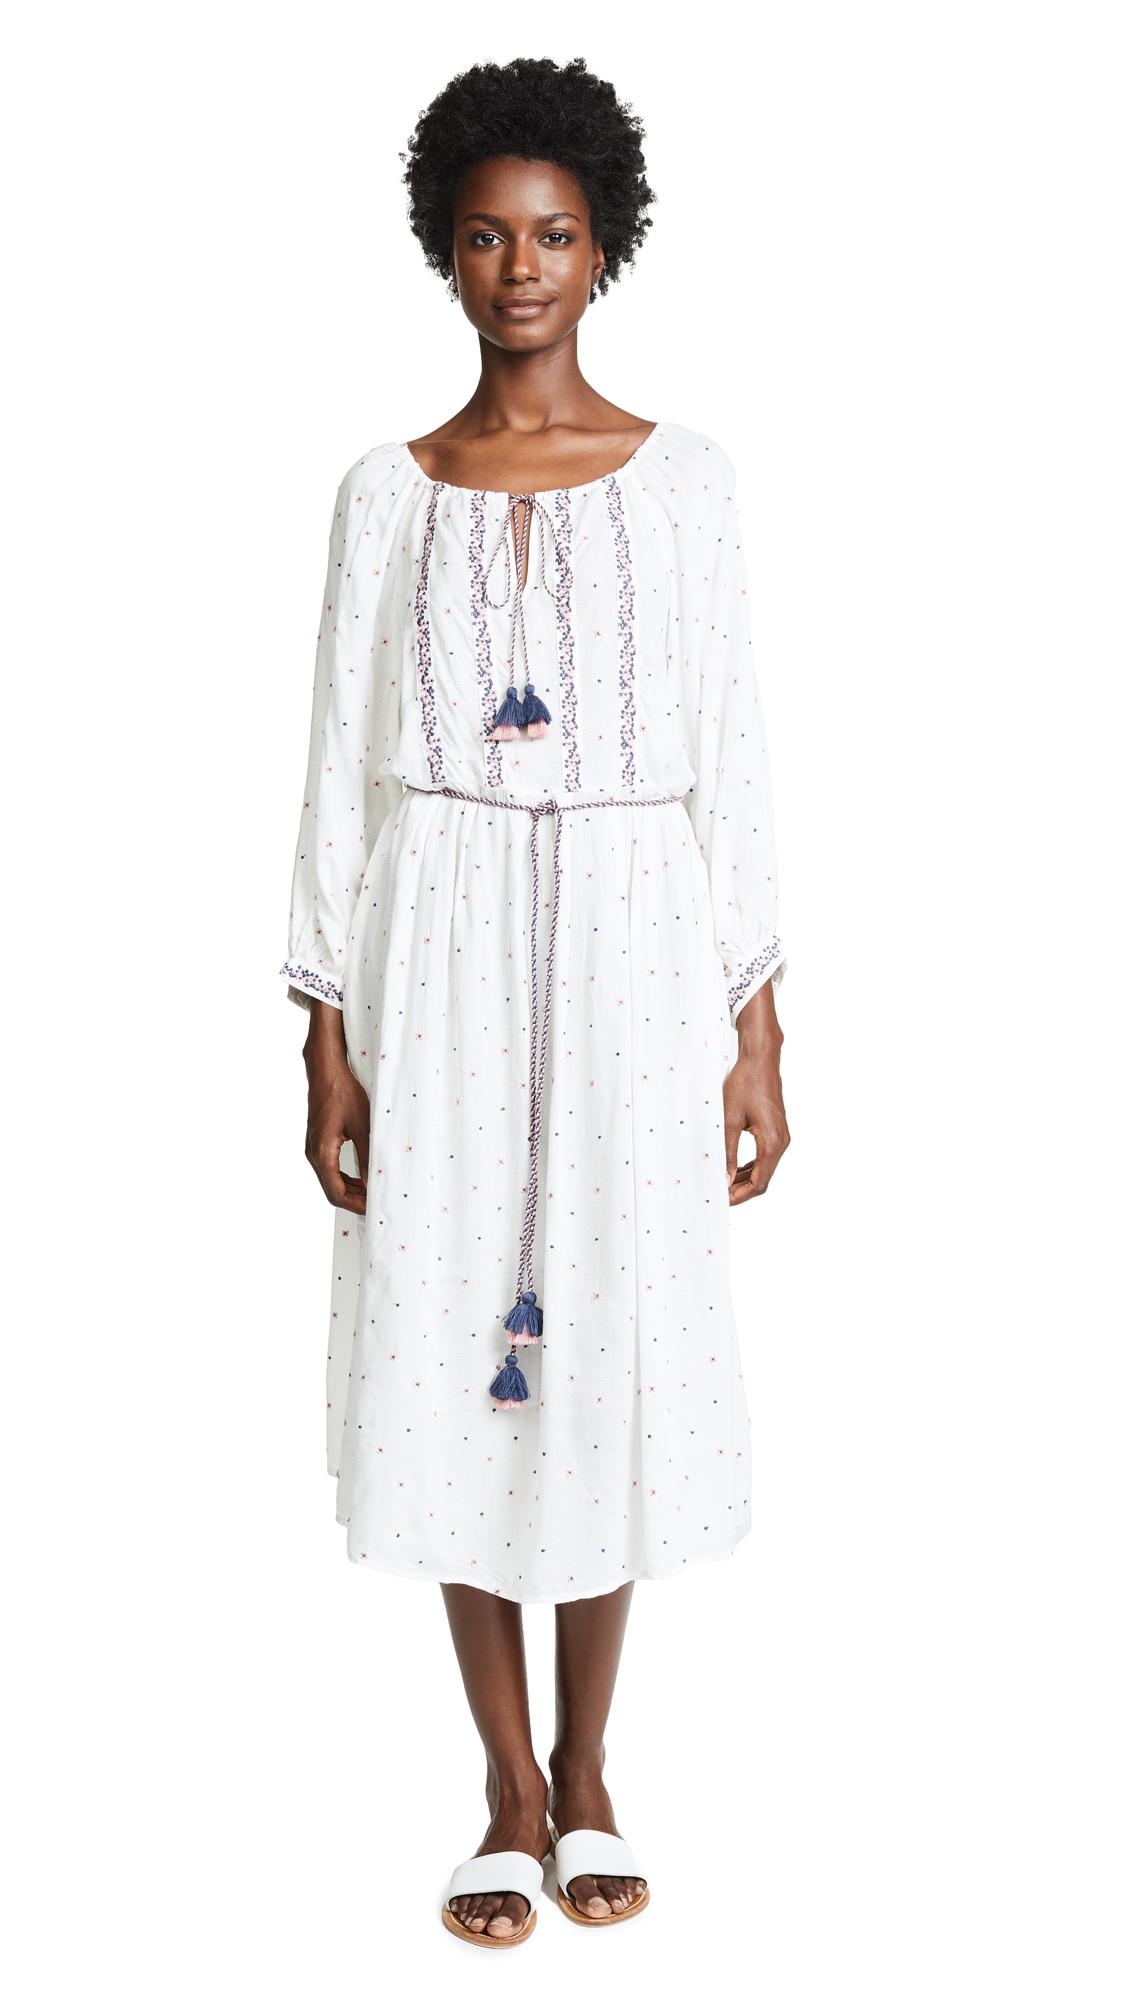 ISILDA EMBROIDERED DRESS